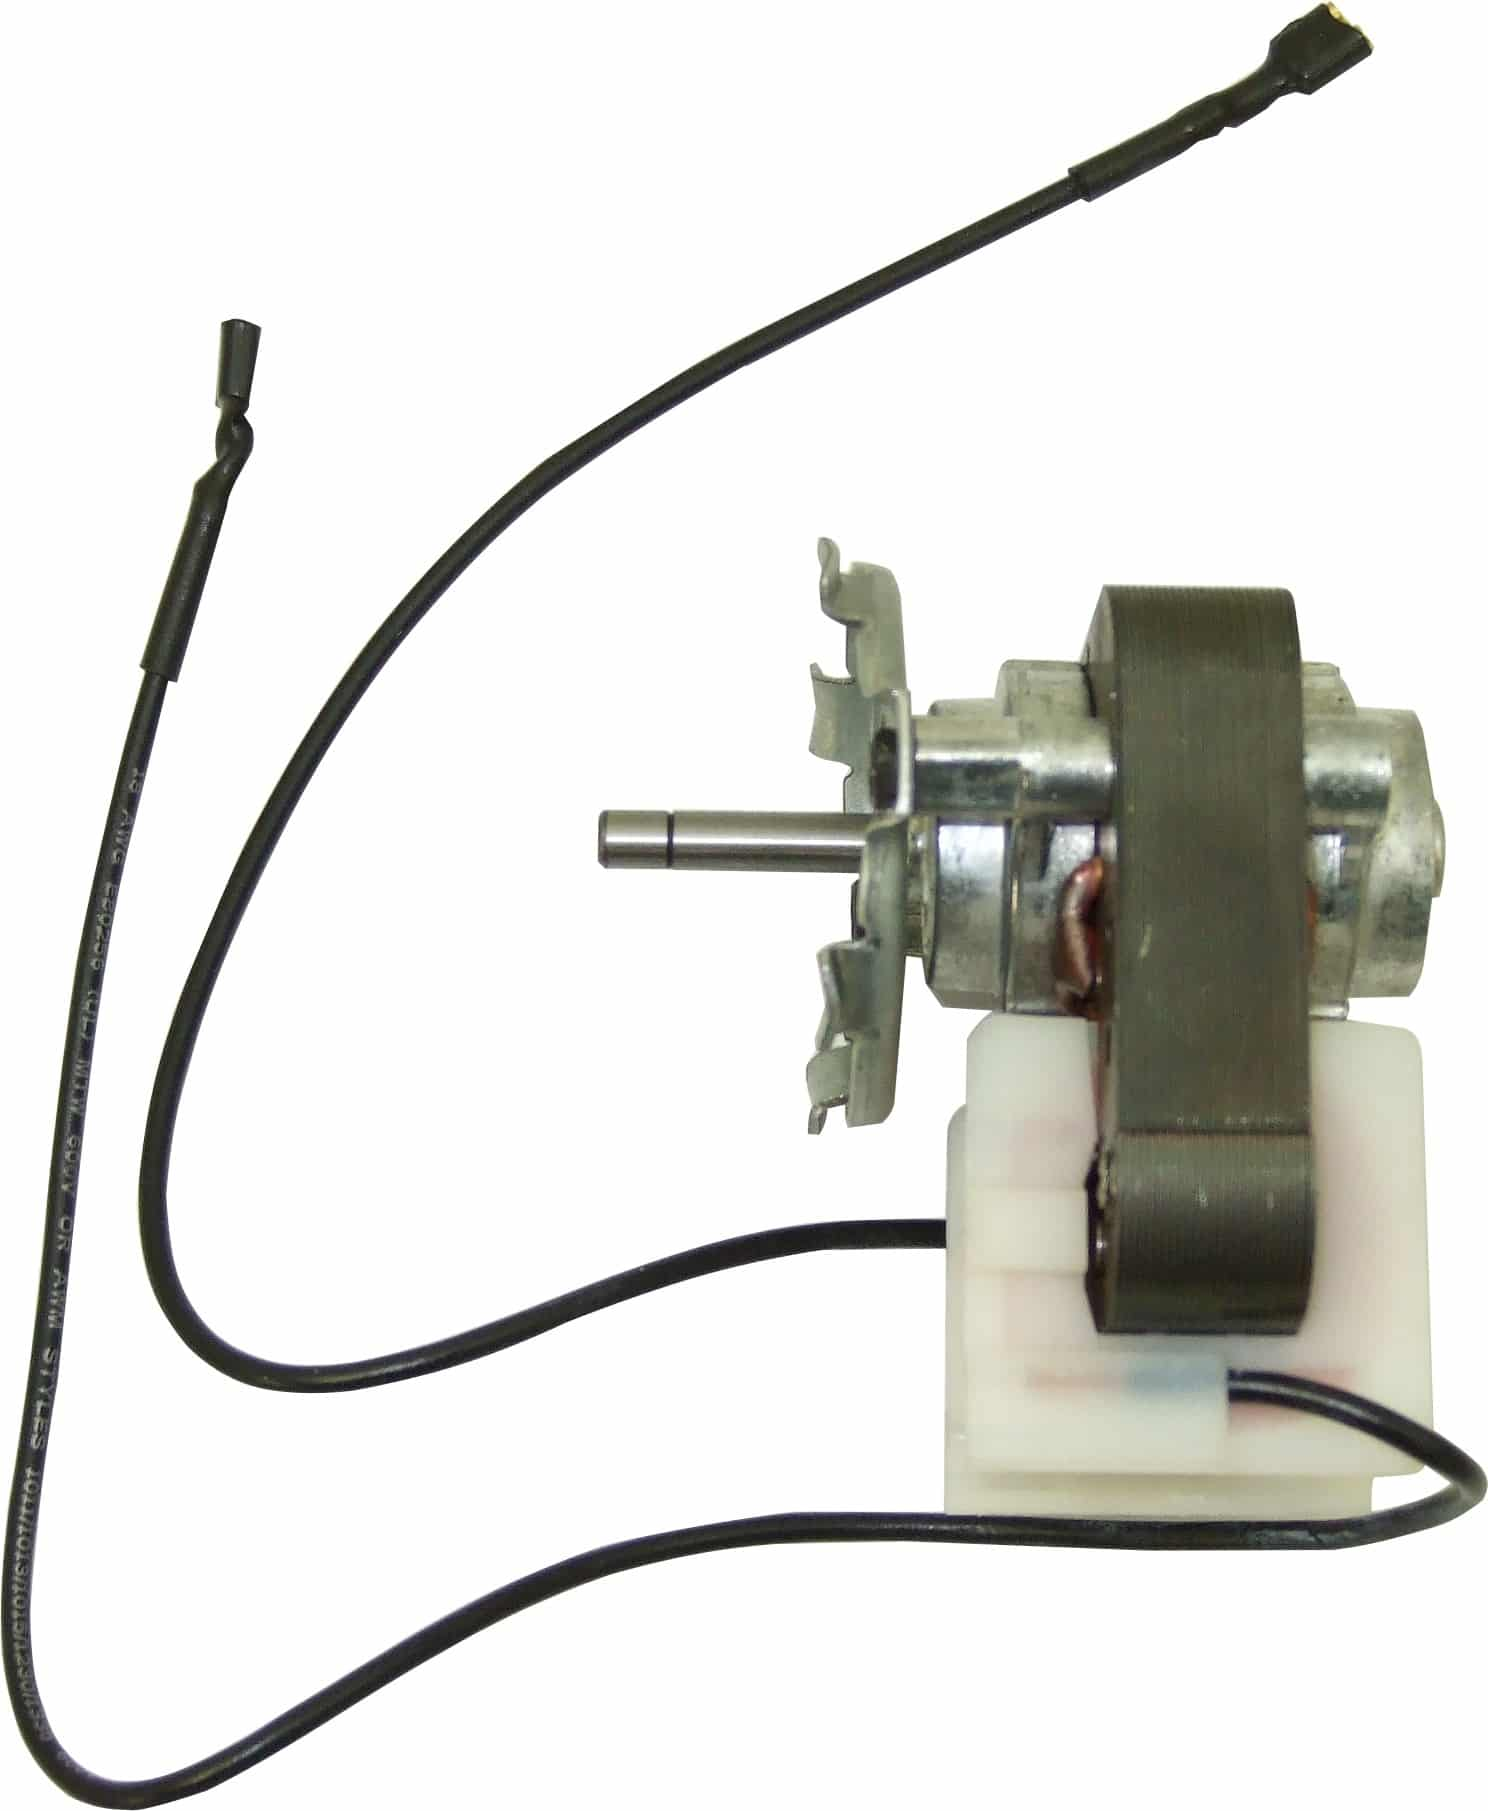 Fan Motor Us003 Edenpure Heater Parts Airnmore Com